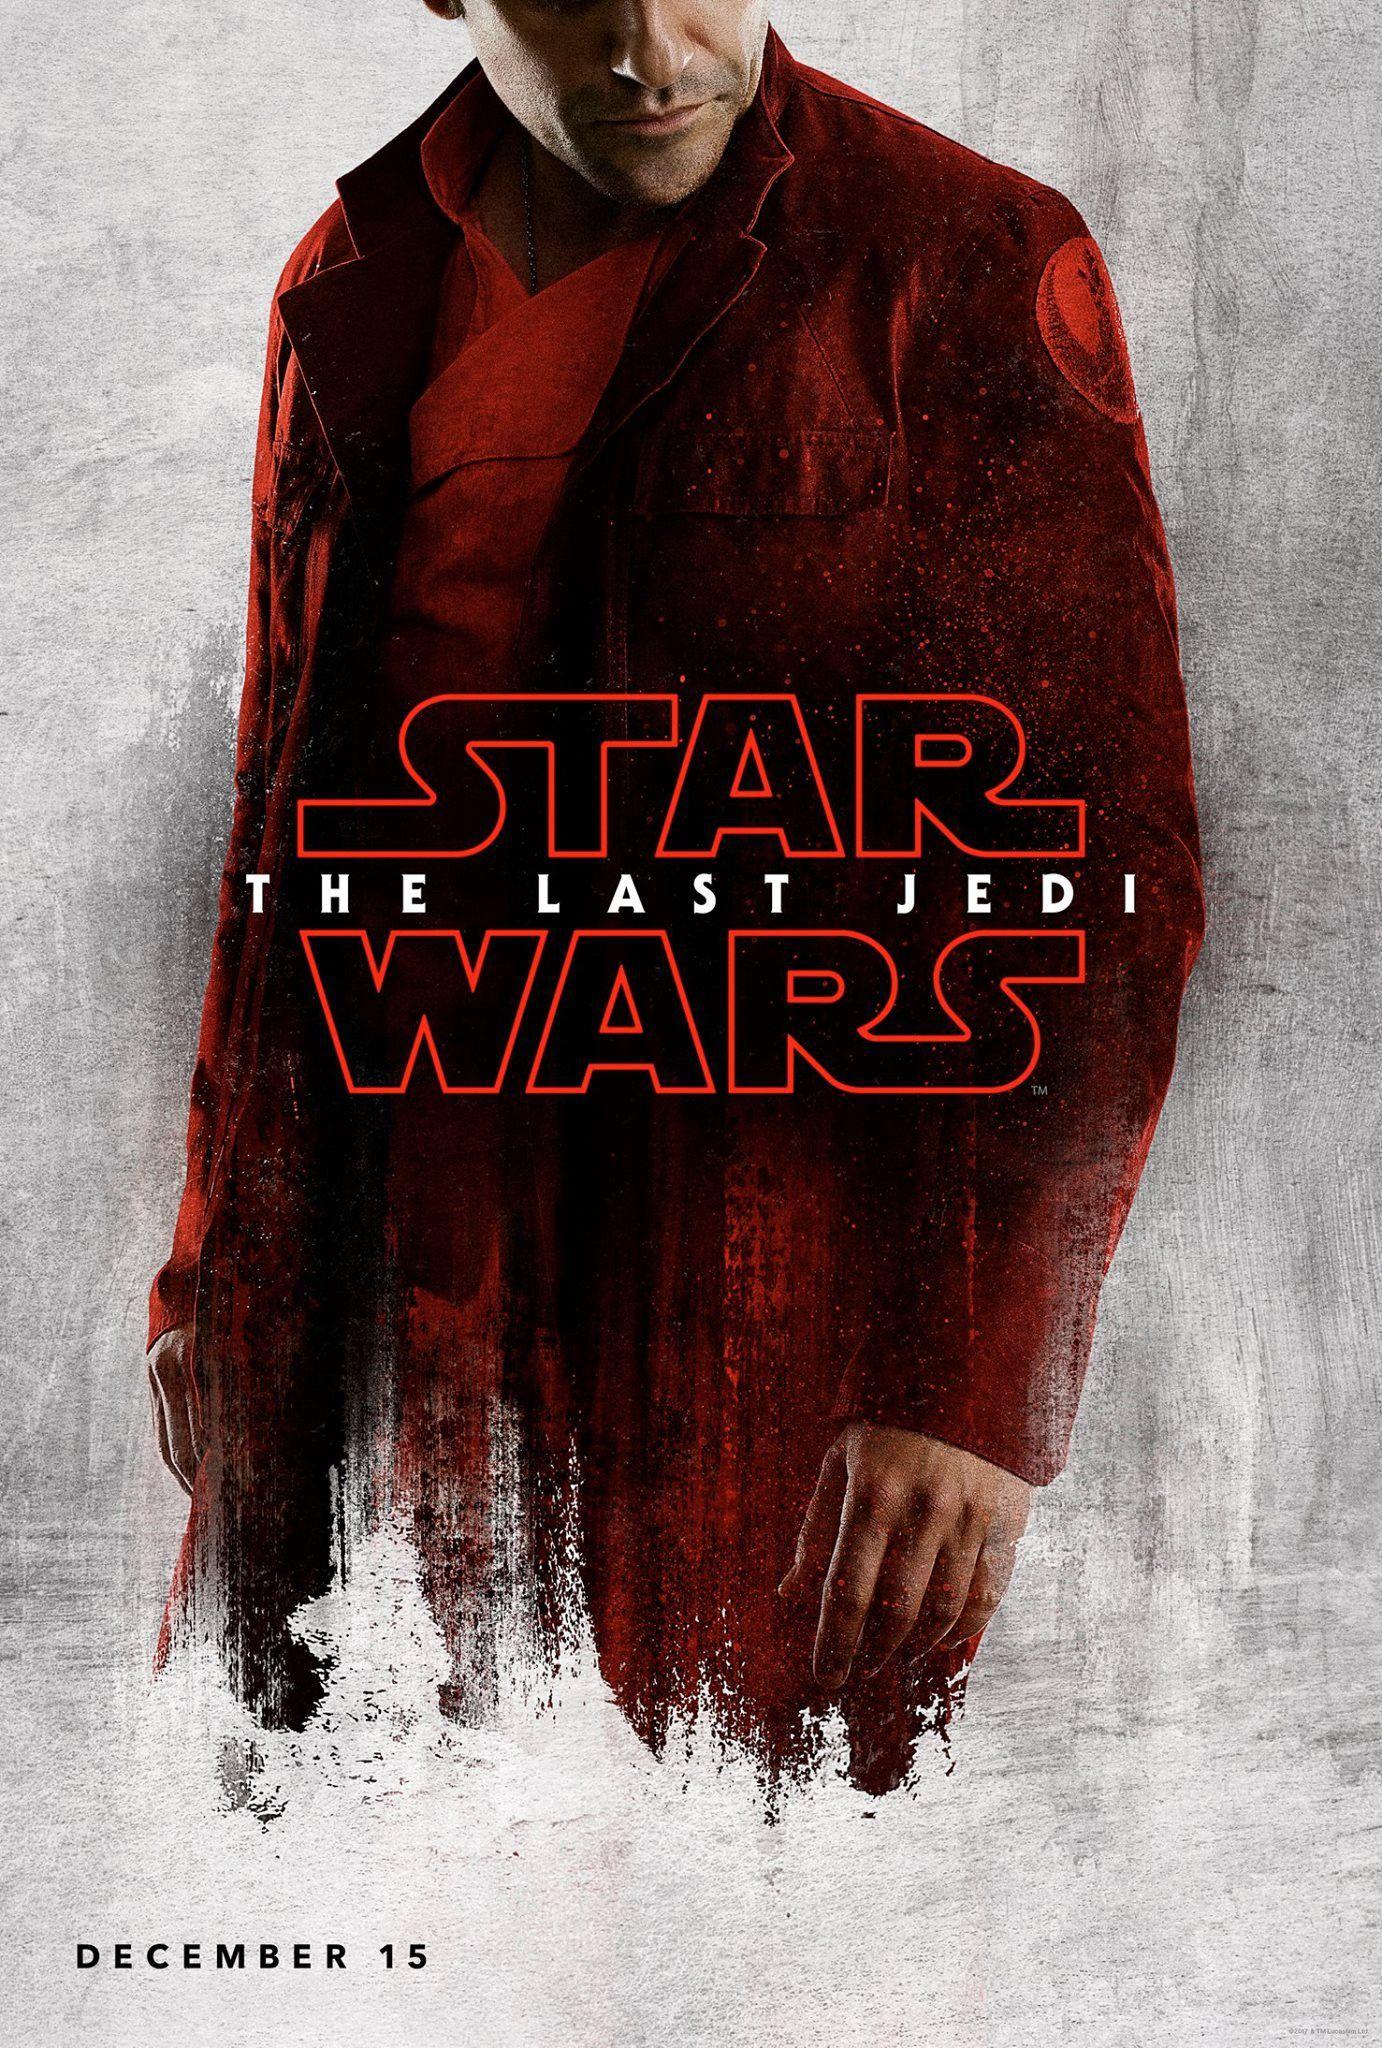 Star Wars The Last Jedi Poster Poe Dameron Jpeg Star Wars Watch Star Wars Episodes New Star Wars